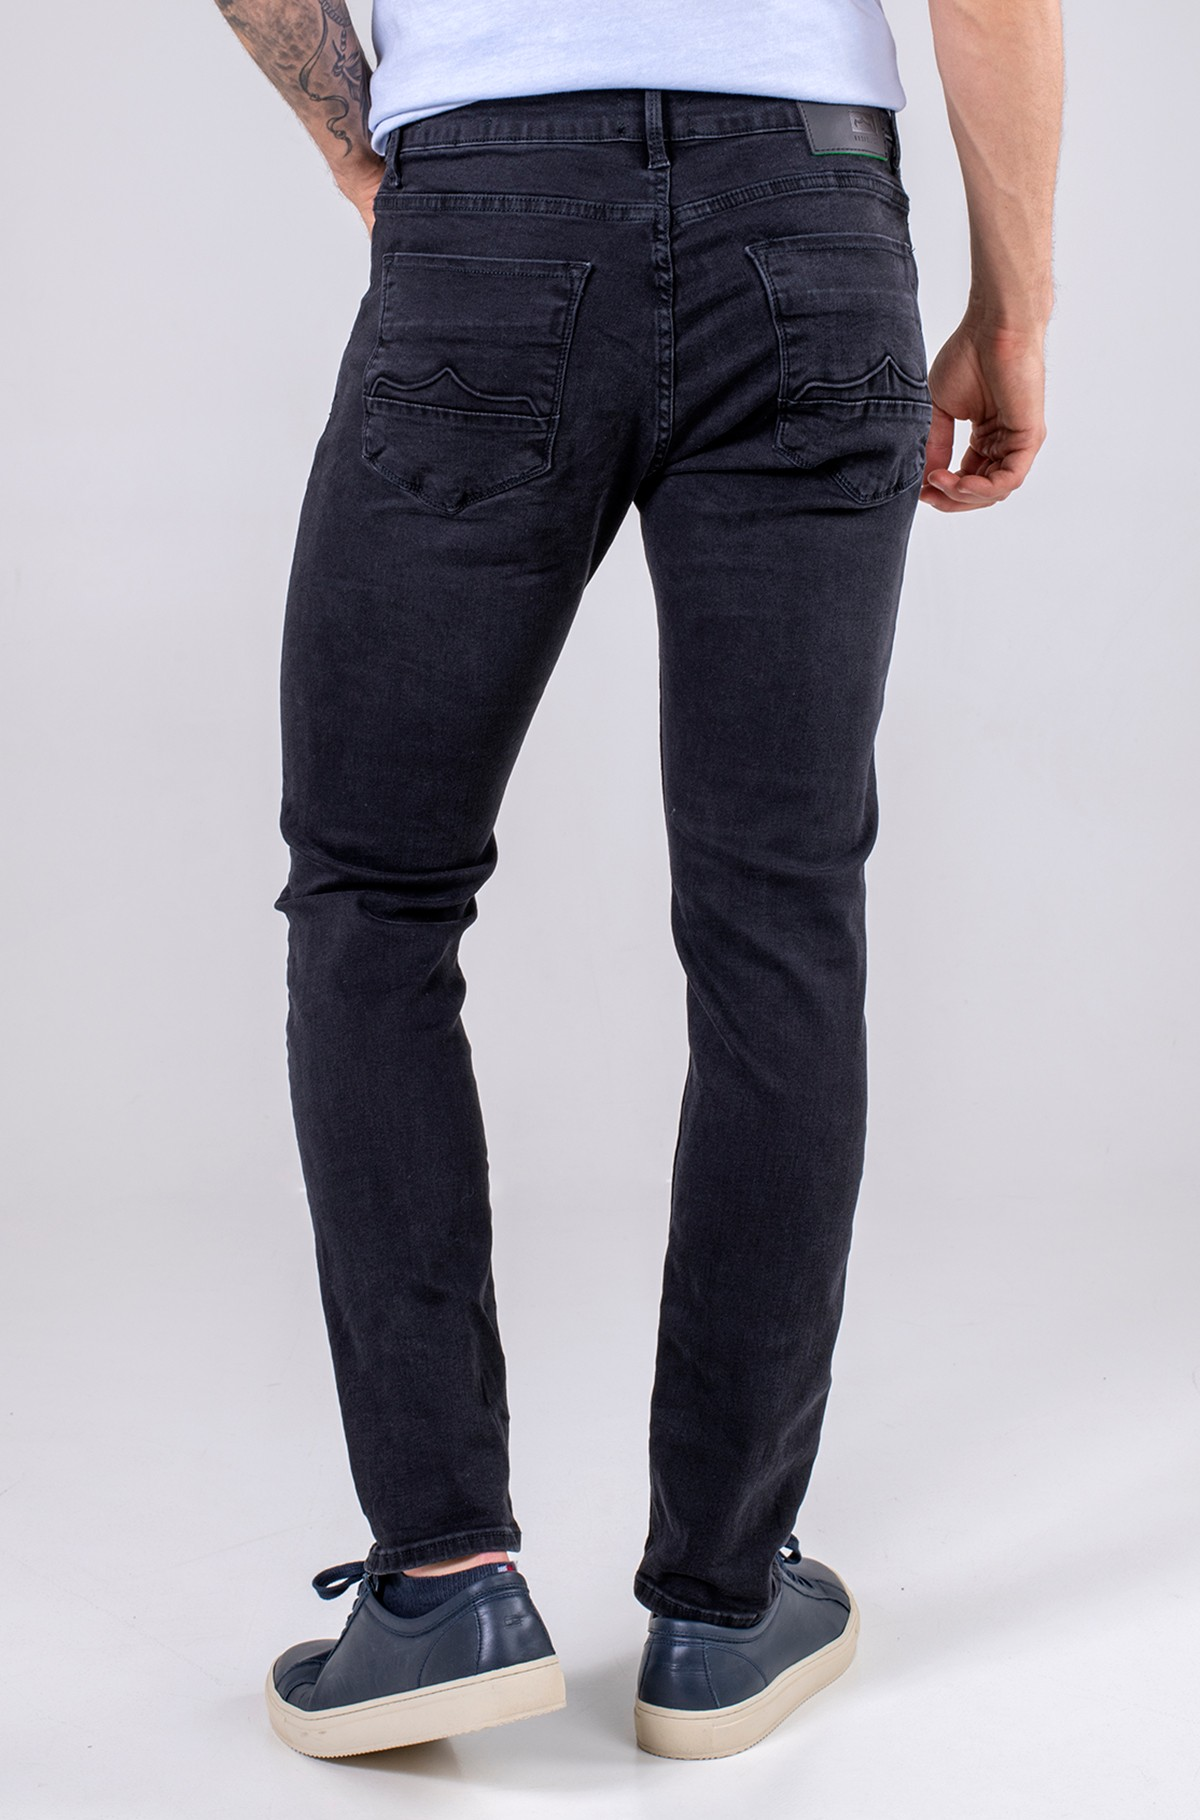 Jeans MORIARTY LAK 409-full-2